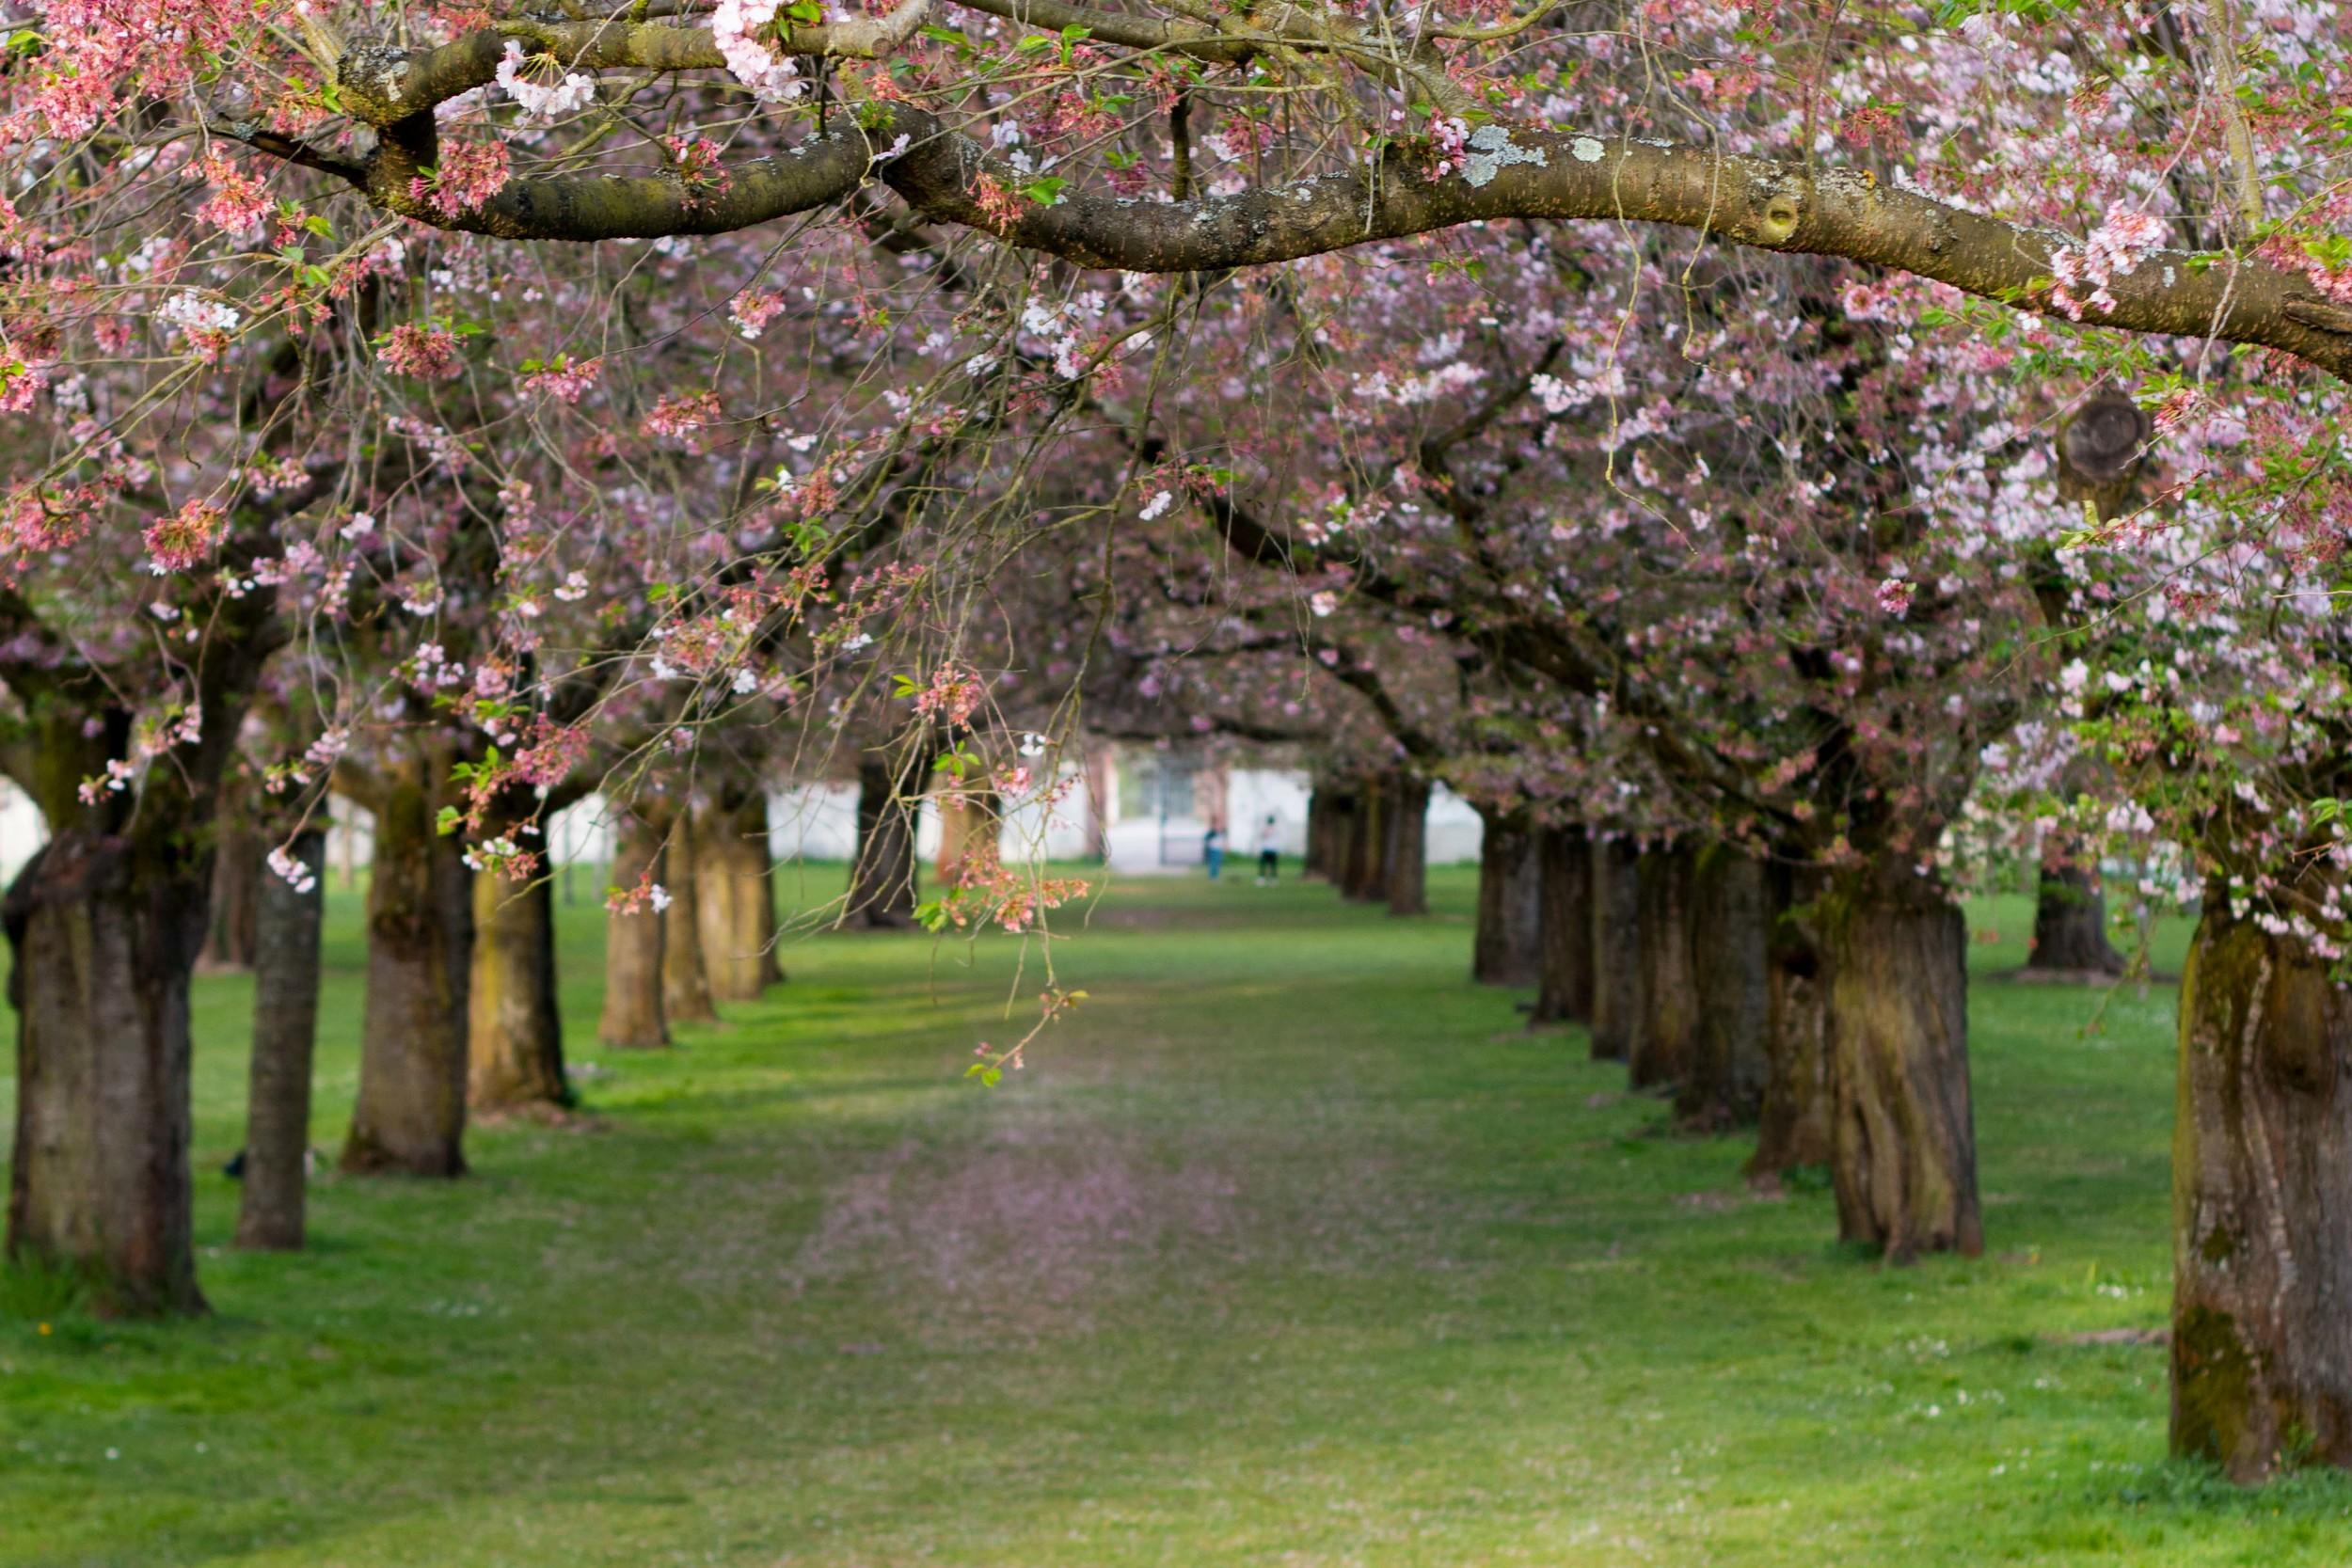 cherry blossoms in bloomat the Schwetzingen Gardens